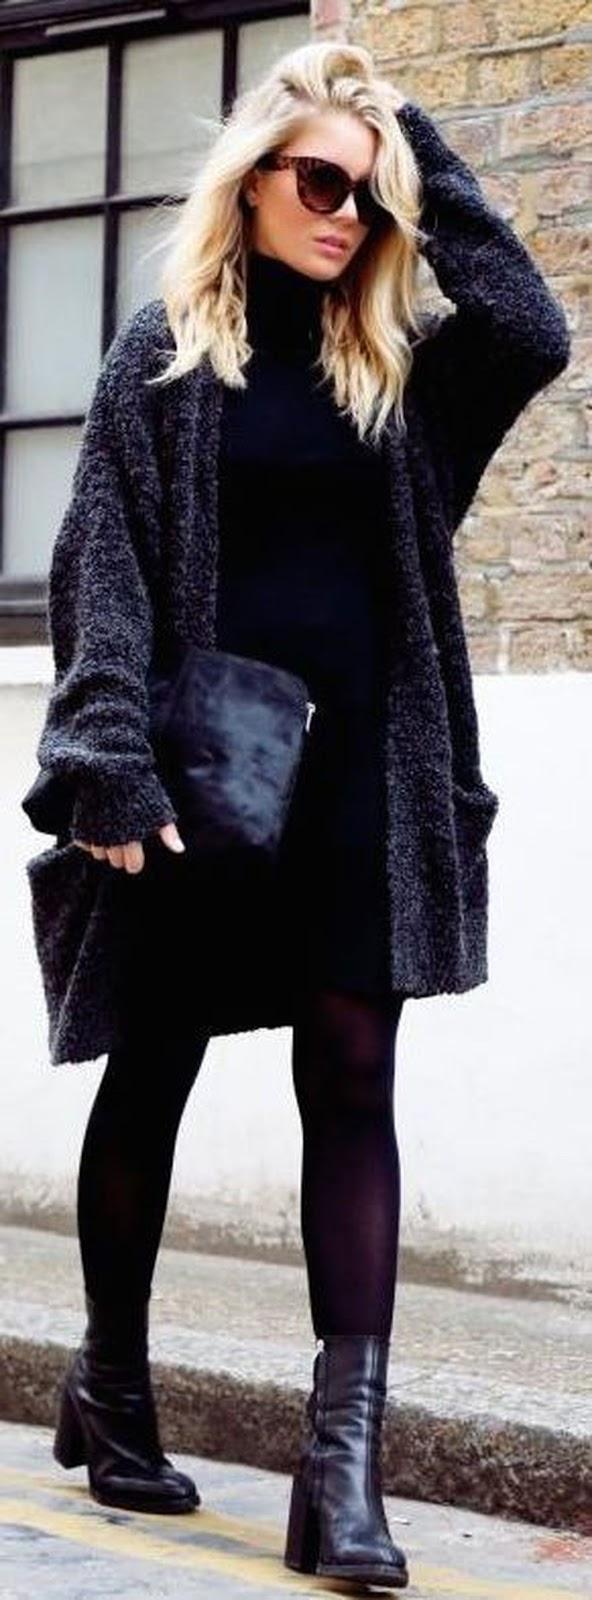 black on black / cozy cardigan + high neck sweater + clutch + skirt + boots